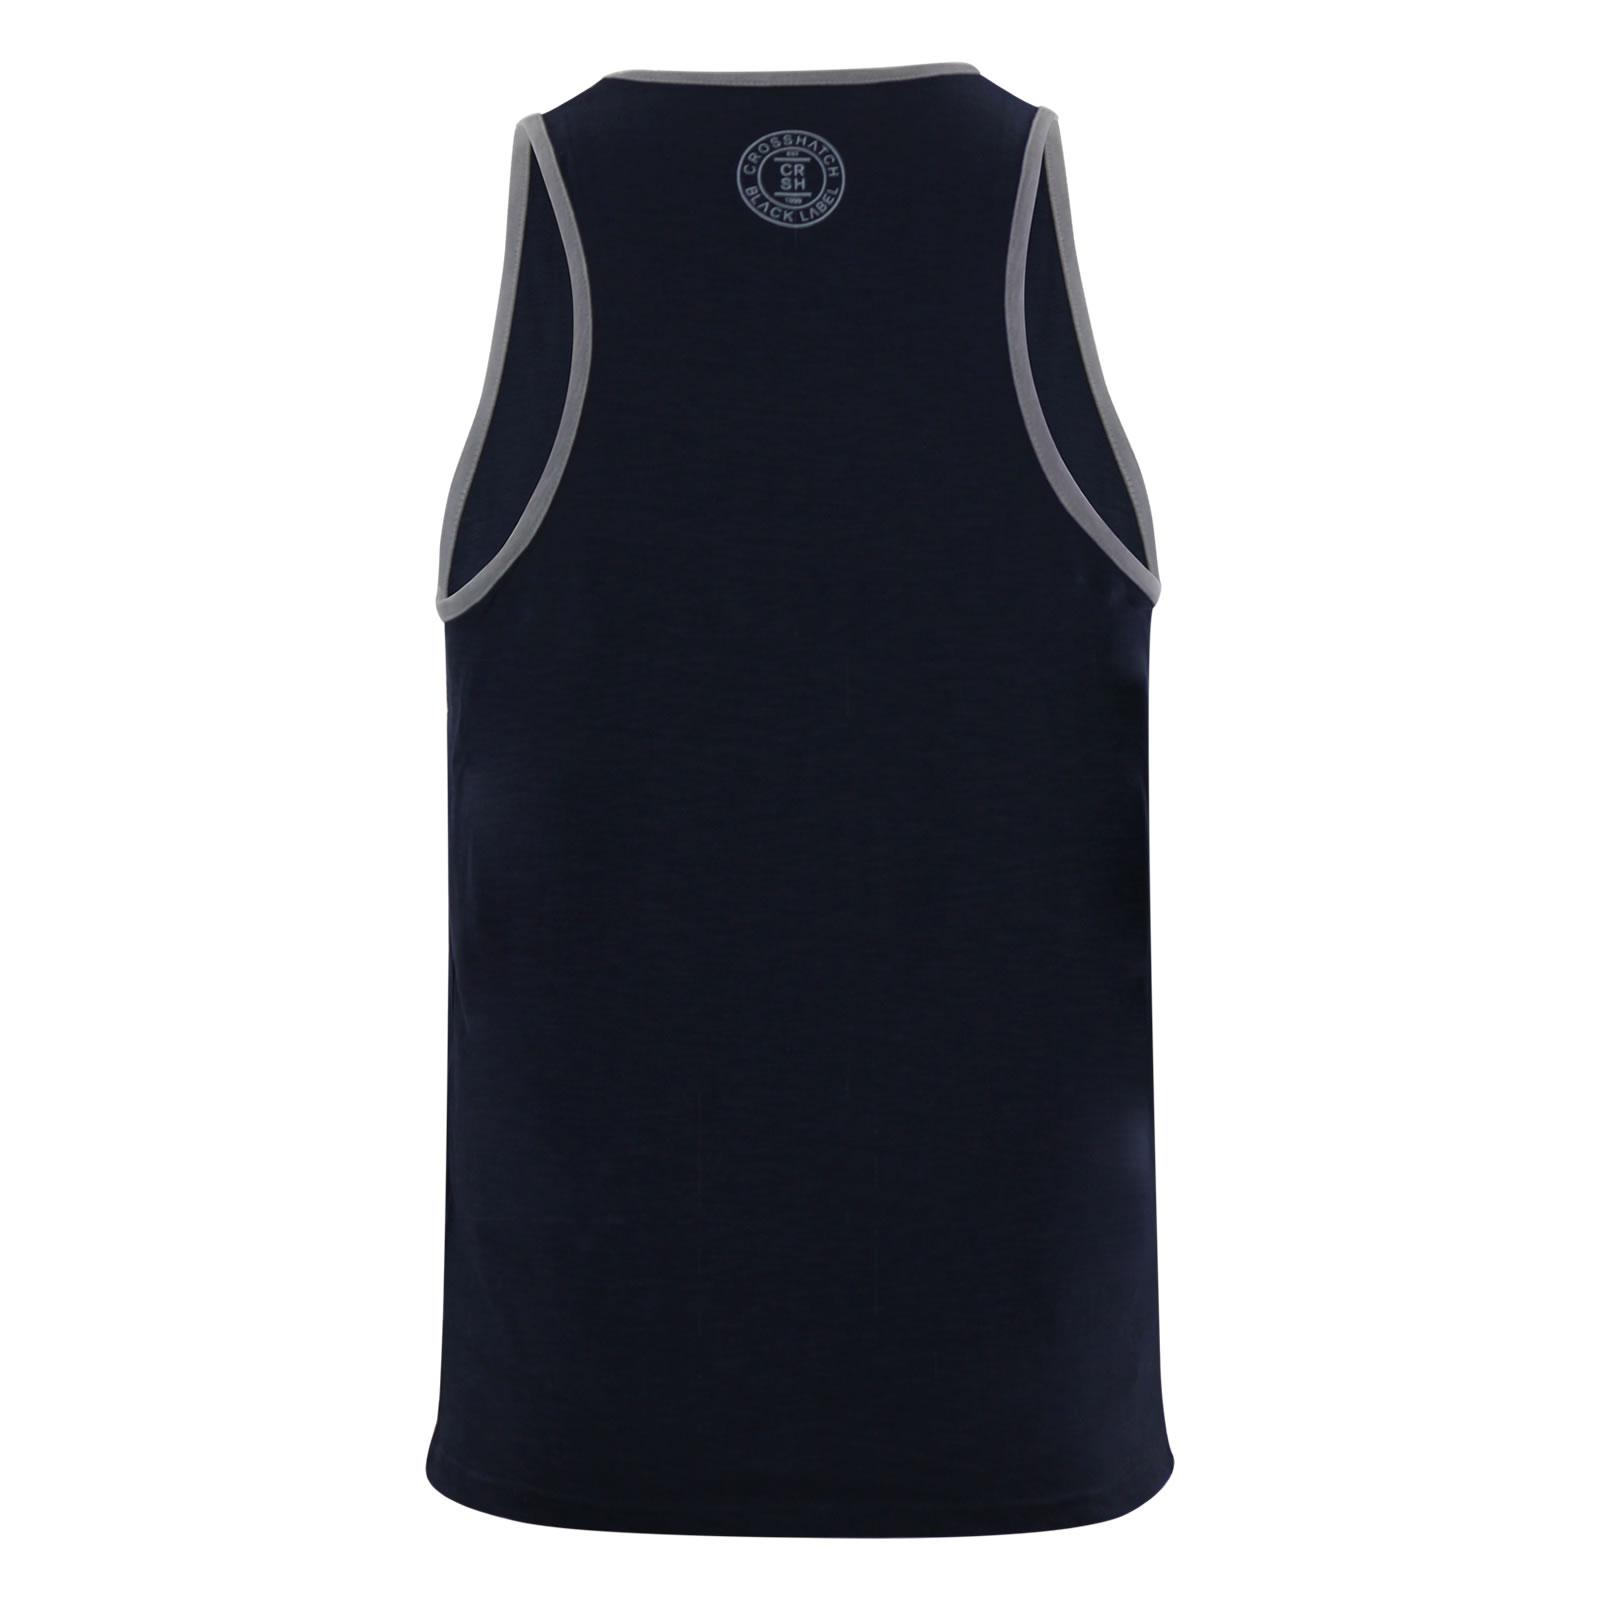 miniature 9 - Homme-debardeur-t-shirt-crosshatch-alfa-summer-muscle-back-tank-top